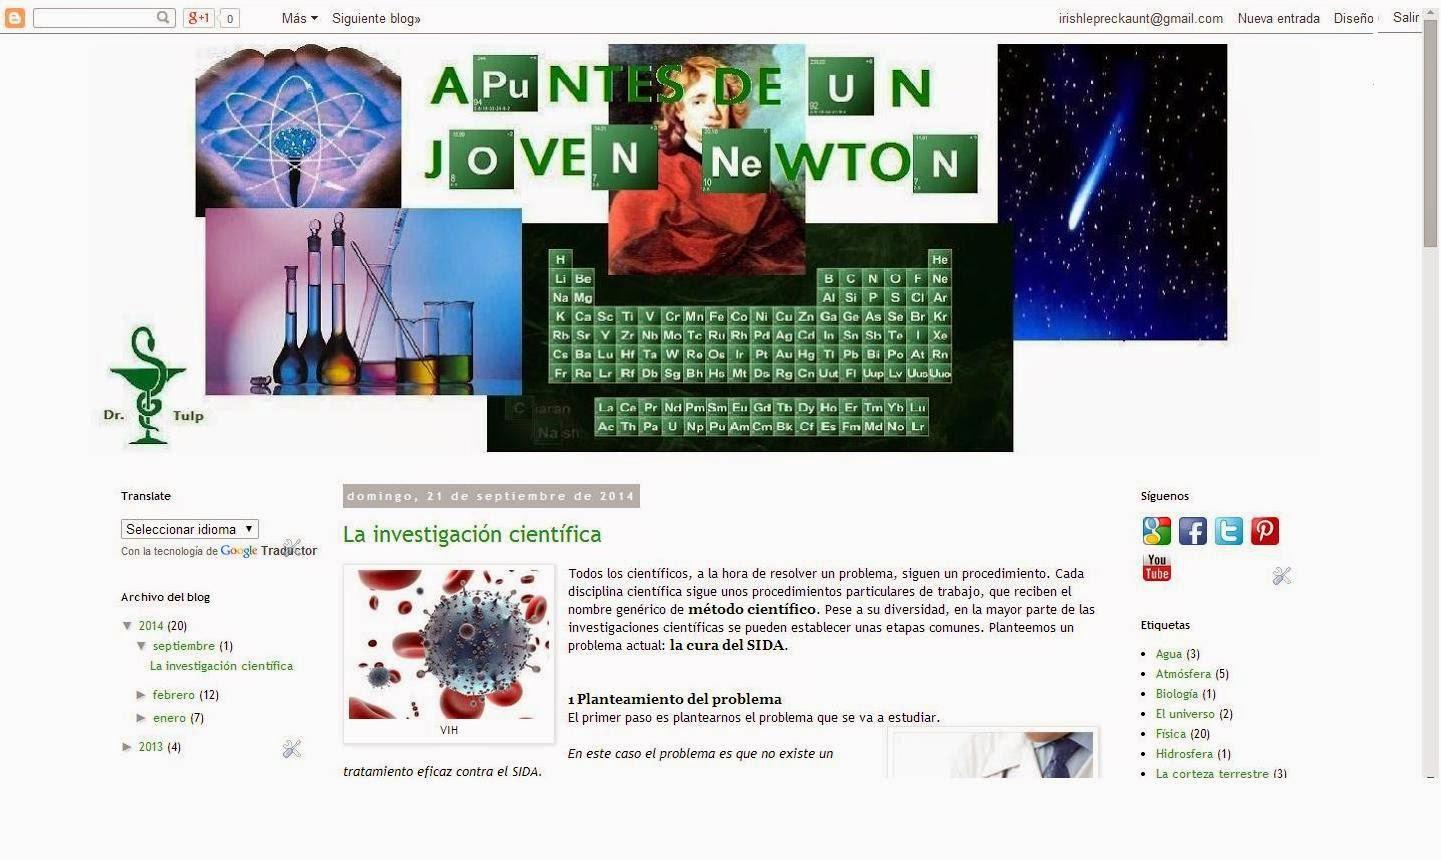 Interfaz de Apuntes de un Joven Newton